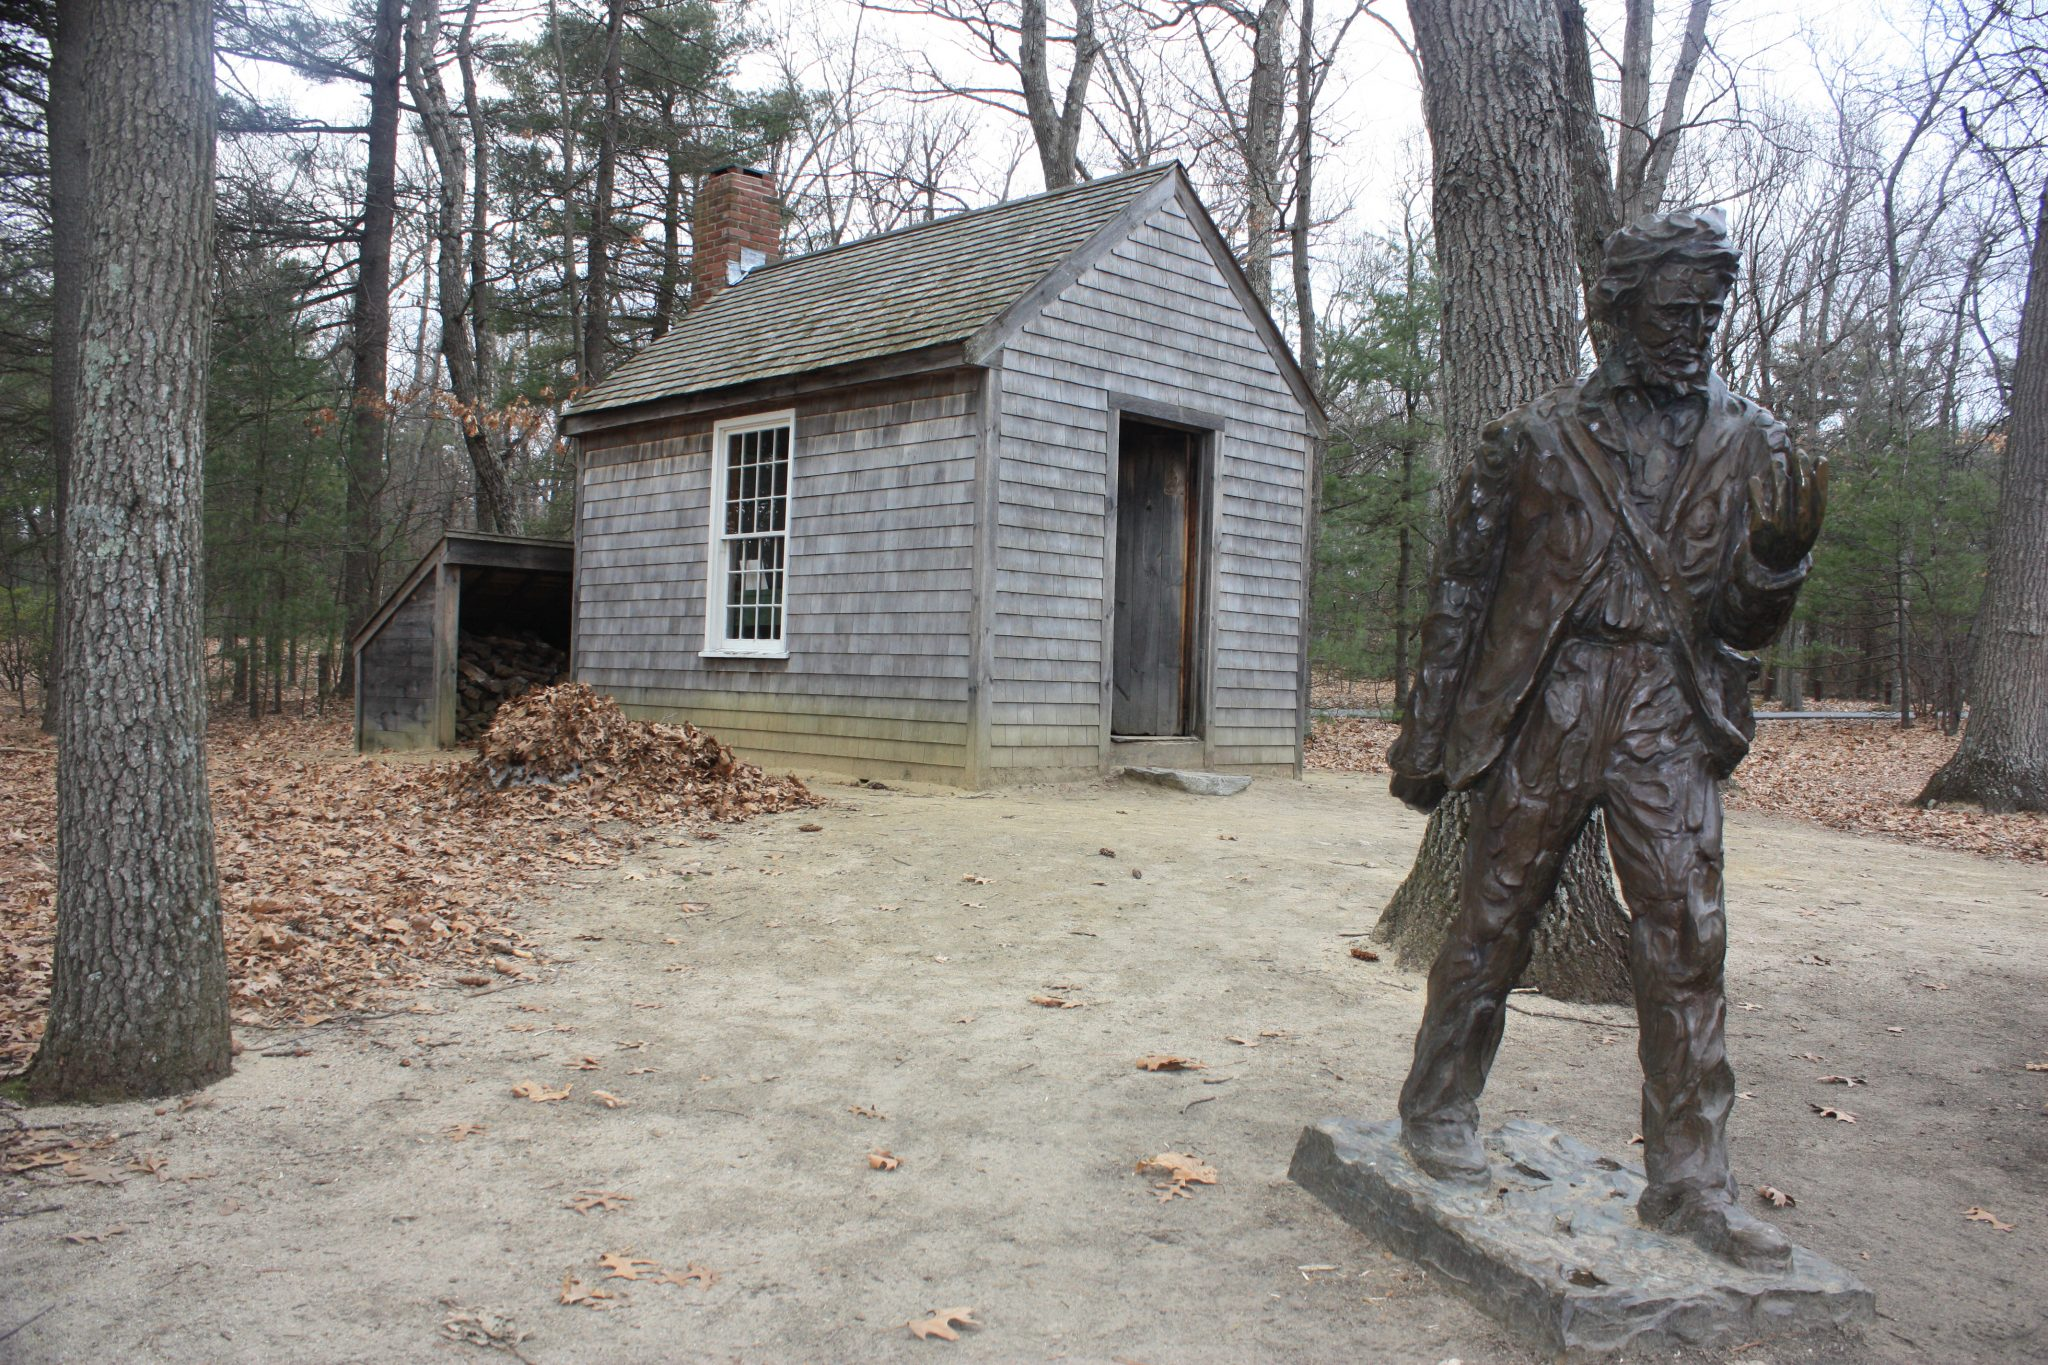 Réplica de la cabaña de Henry David Thoreau en Walden Pond